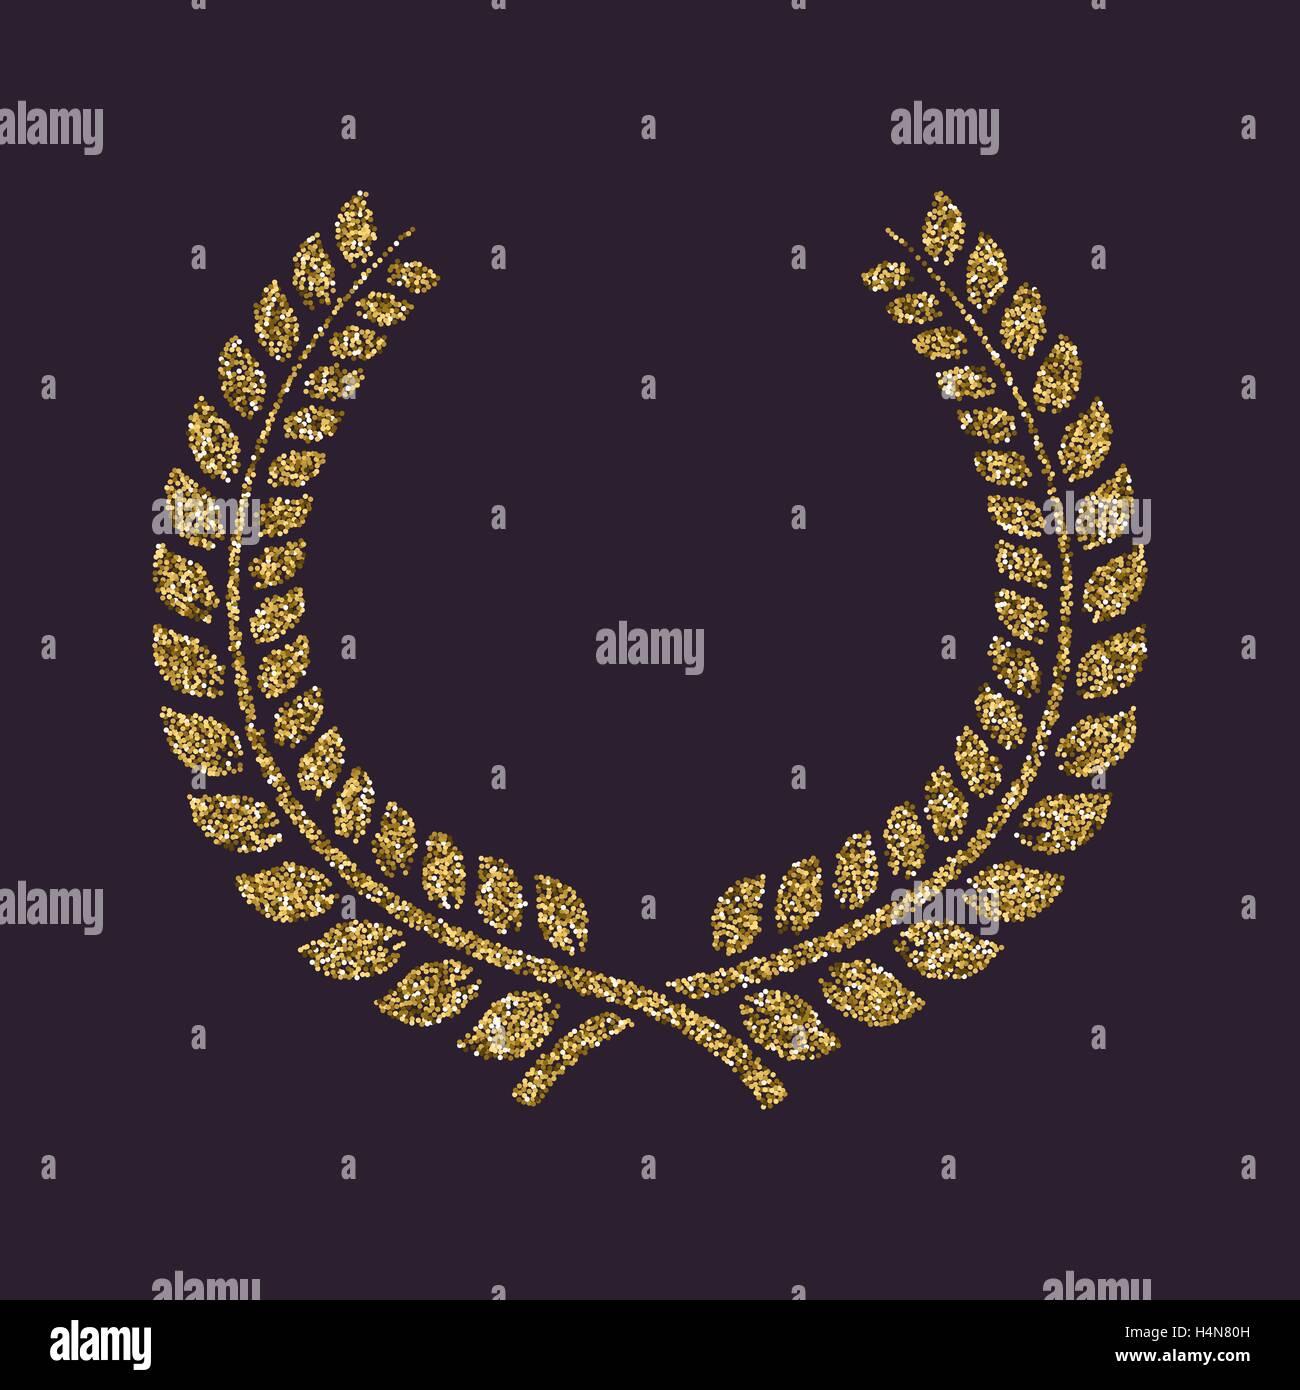 Vector Gold Laurel Wreath Leaves Stockfotos & Vector Gold Laurel ...